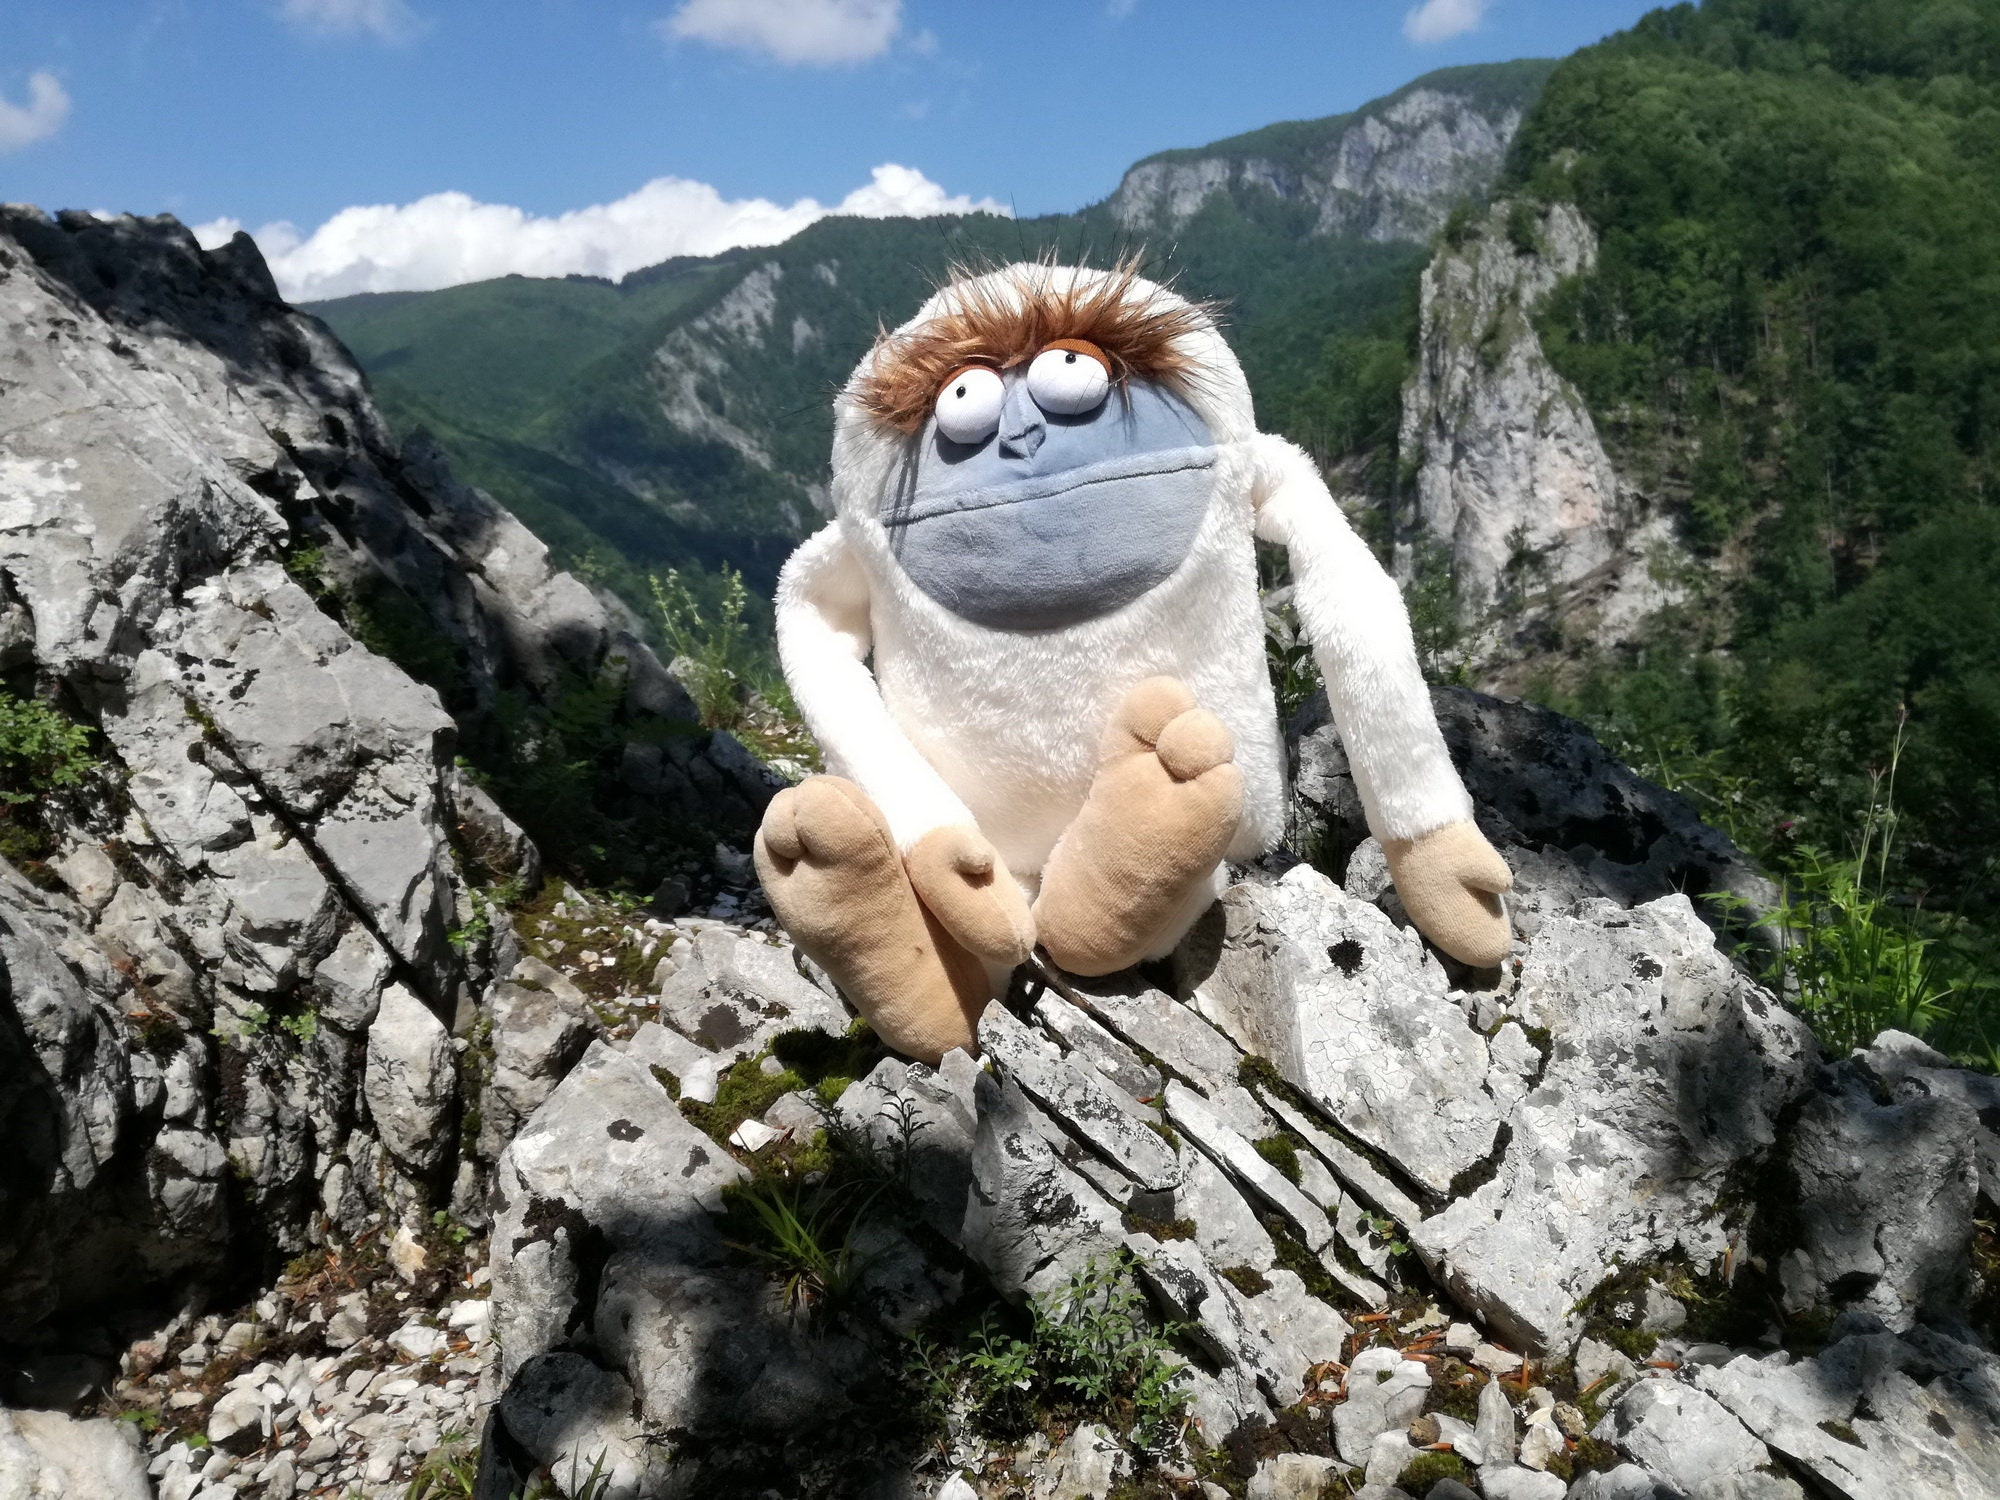 Yeti, Fabulous Bigfoot Plush Monster, Soft Funny Mountain